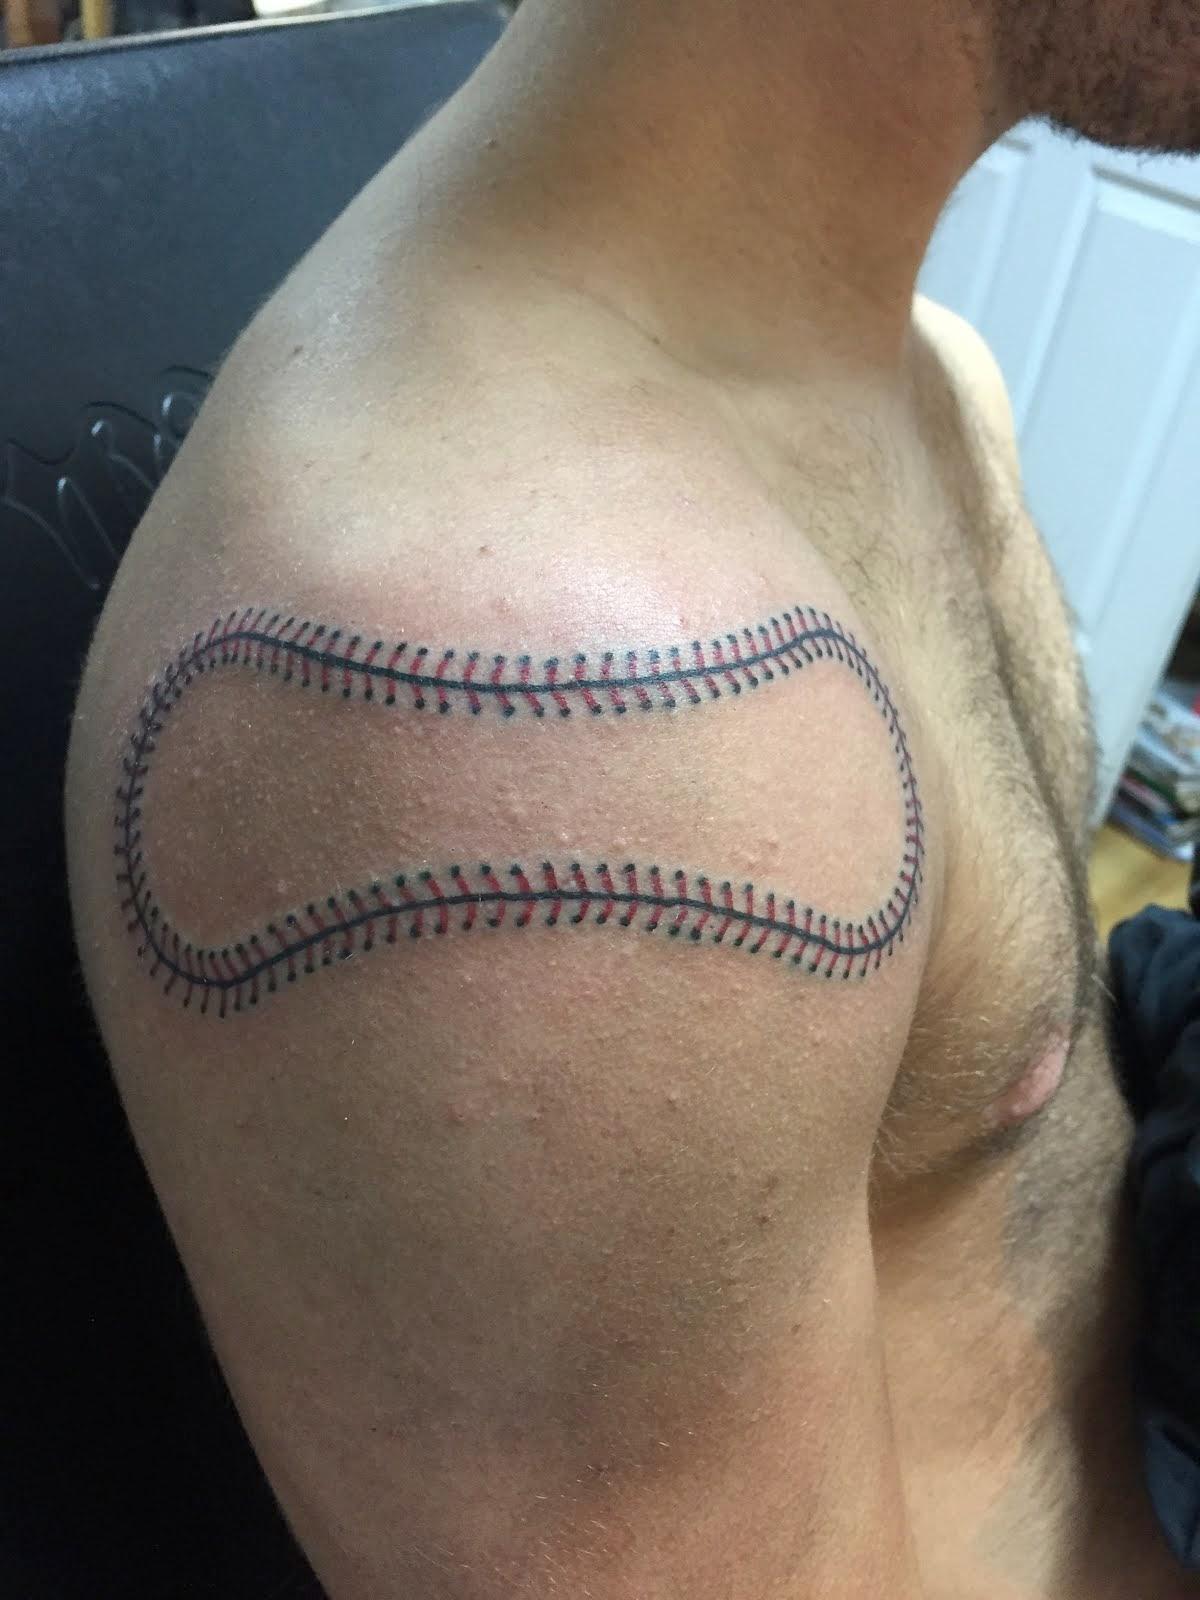 Baseball Stitches Tattoos : baseball, stitches, tattoos, Baseball, Stitches, Tattoo, Gallery, Collection